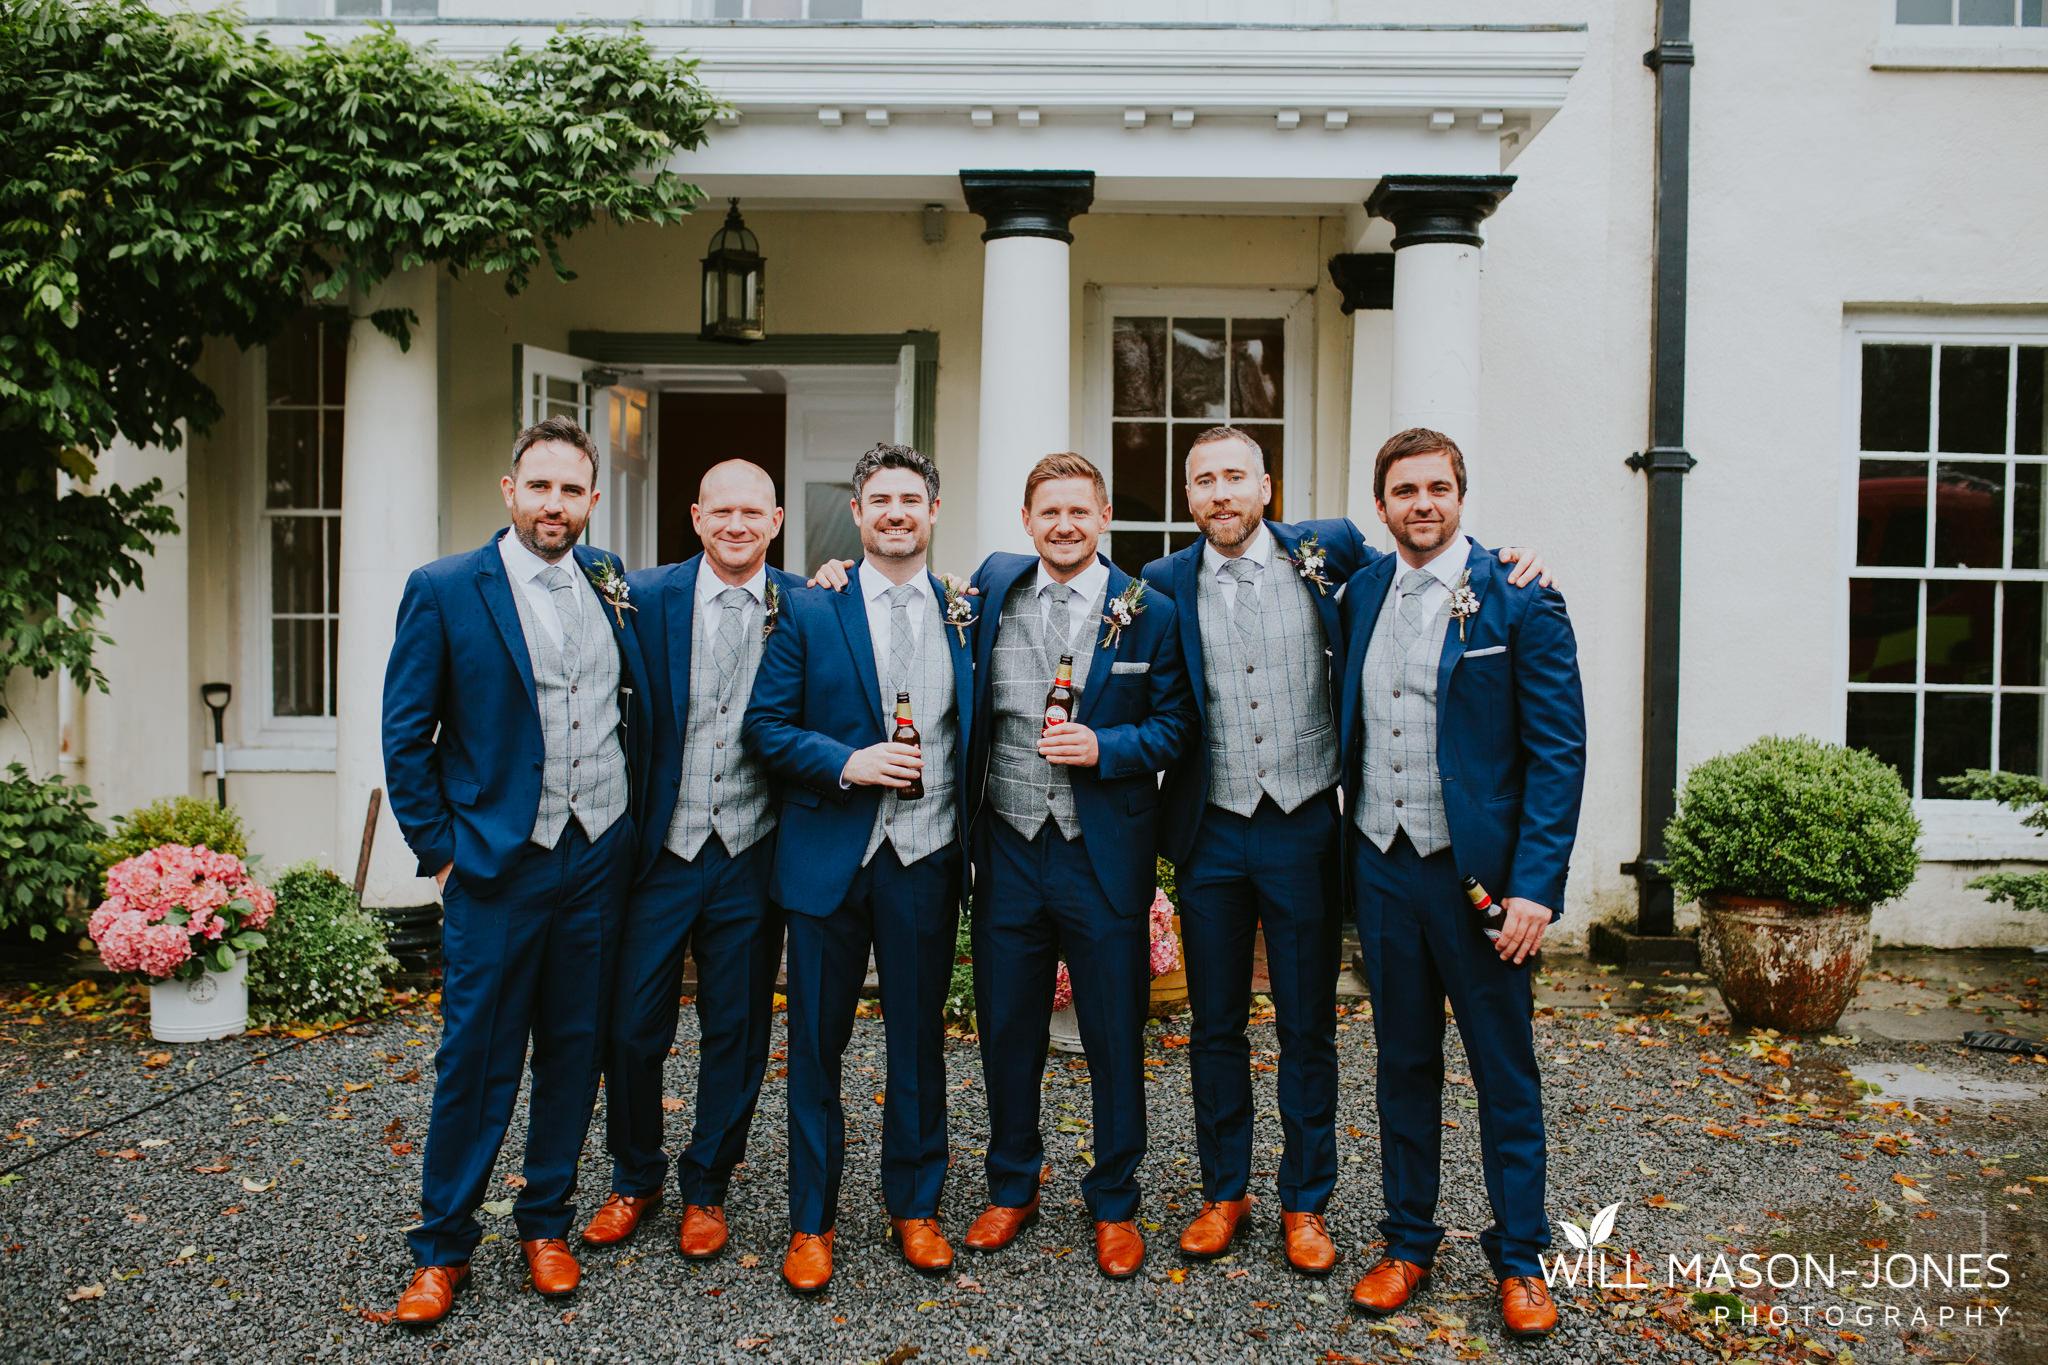 plas-glansevin-wet-rainy-bridal-wedding-preparations-swansea-photographers-6.jpg